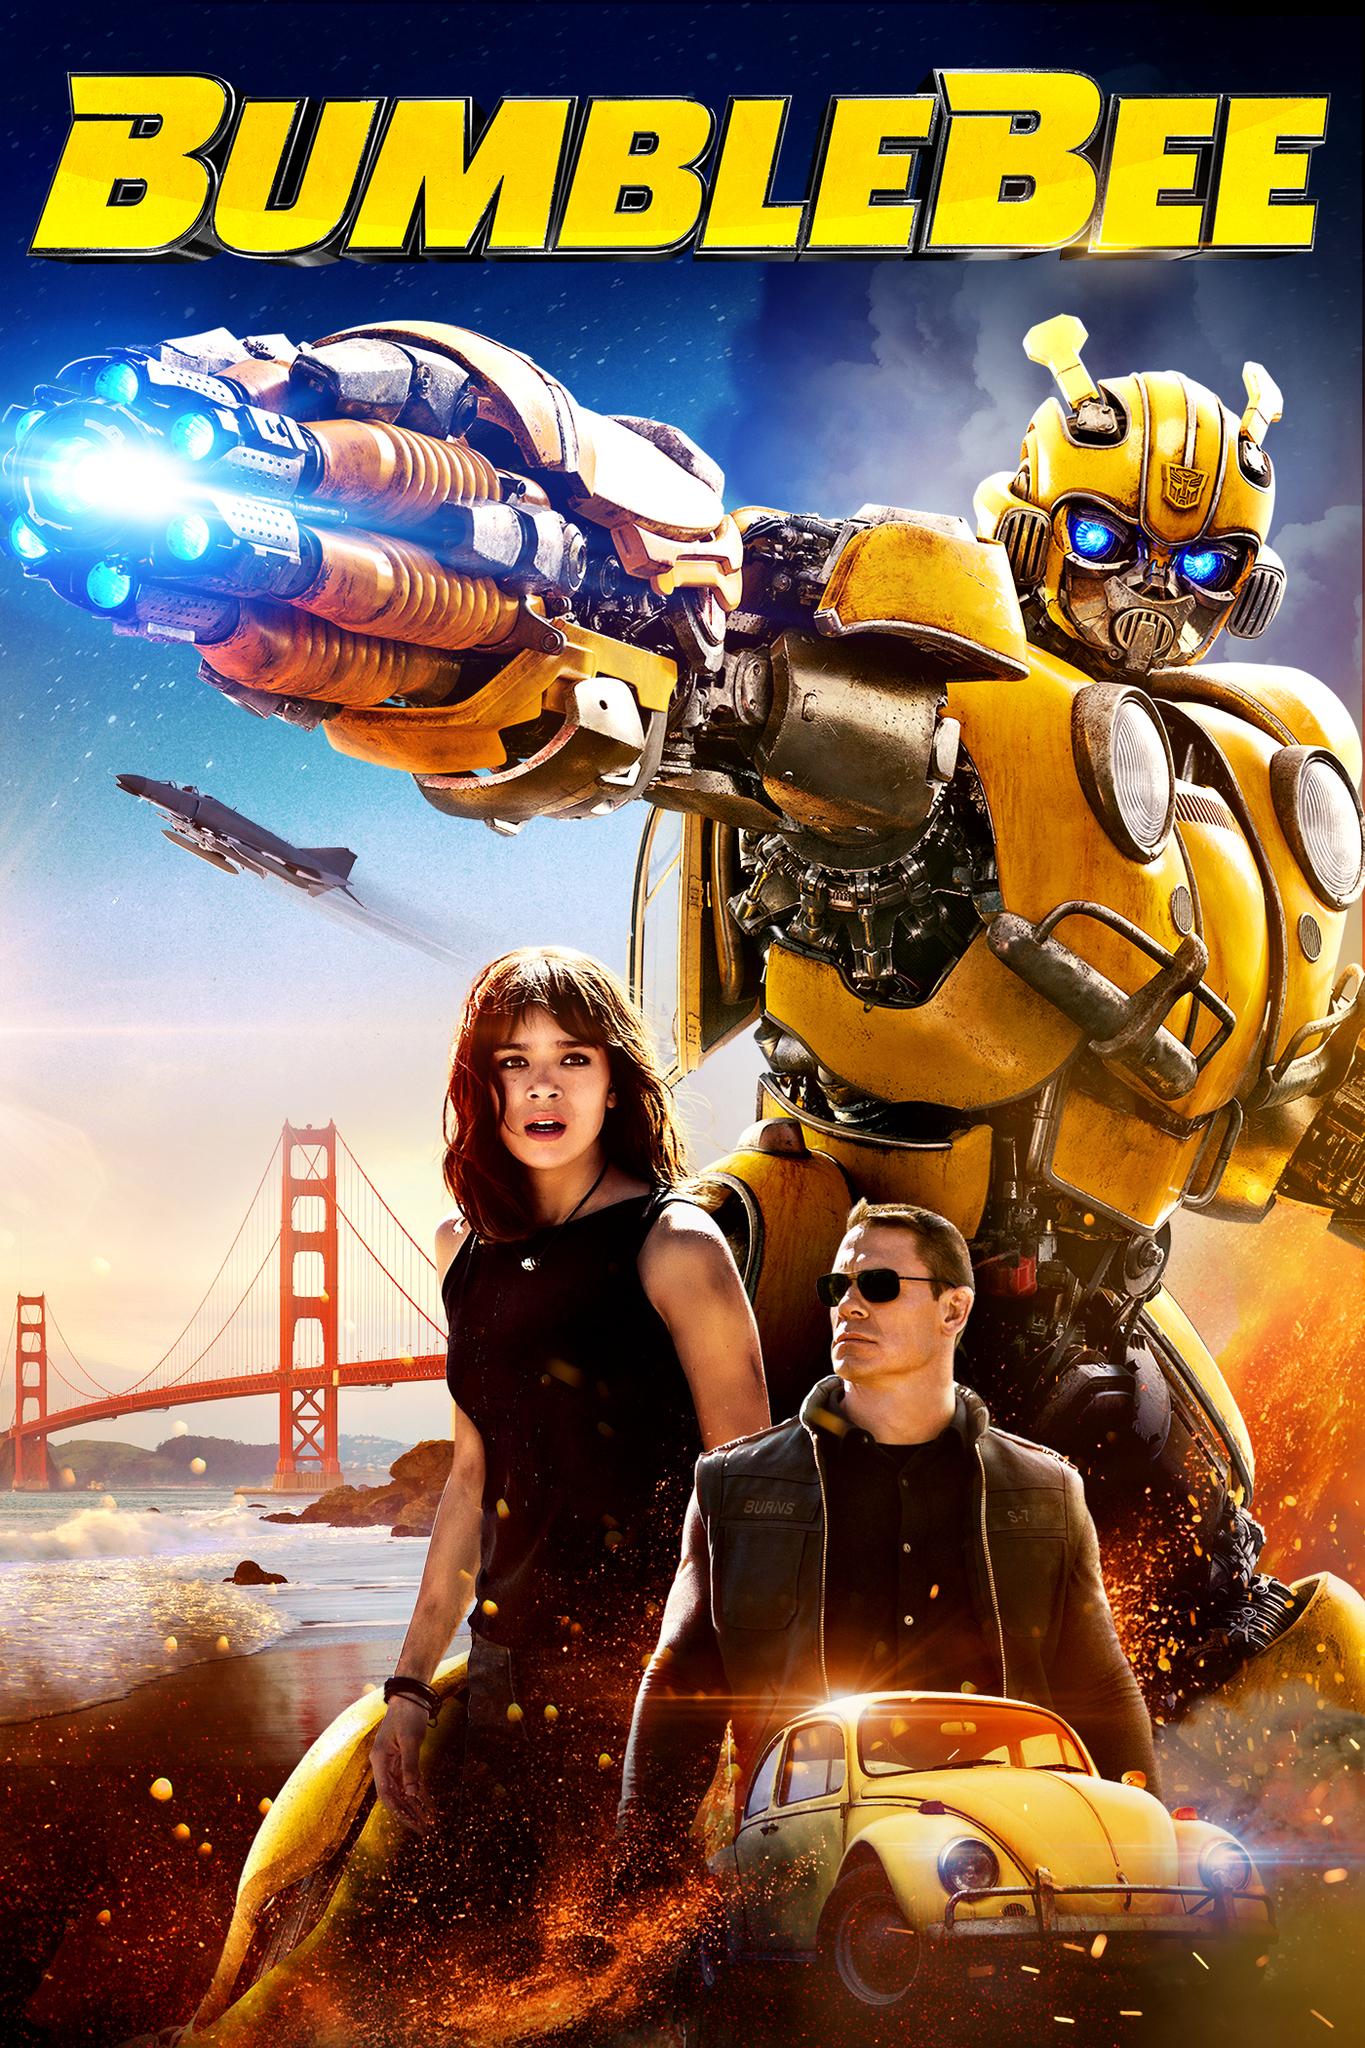 Bumblebee £1.99 rental Amazon Prime Video